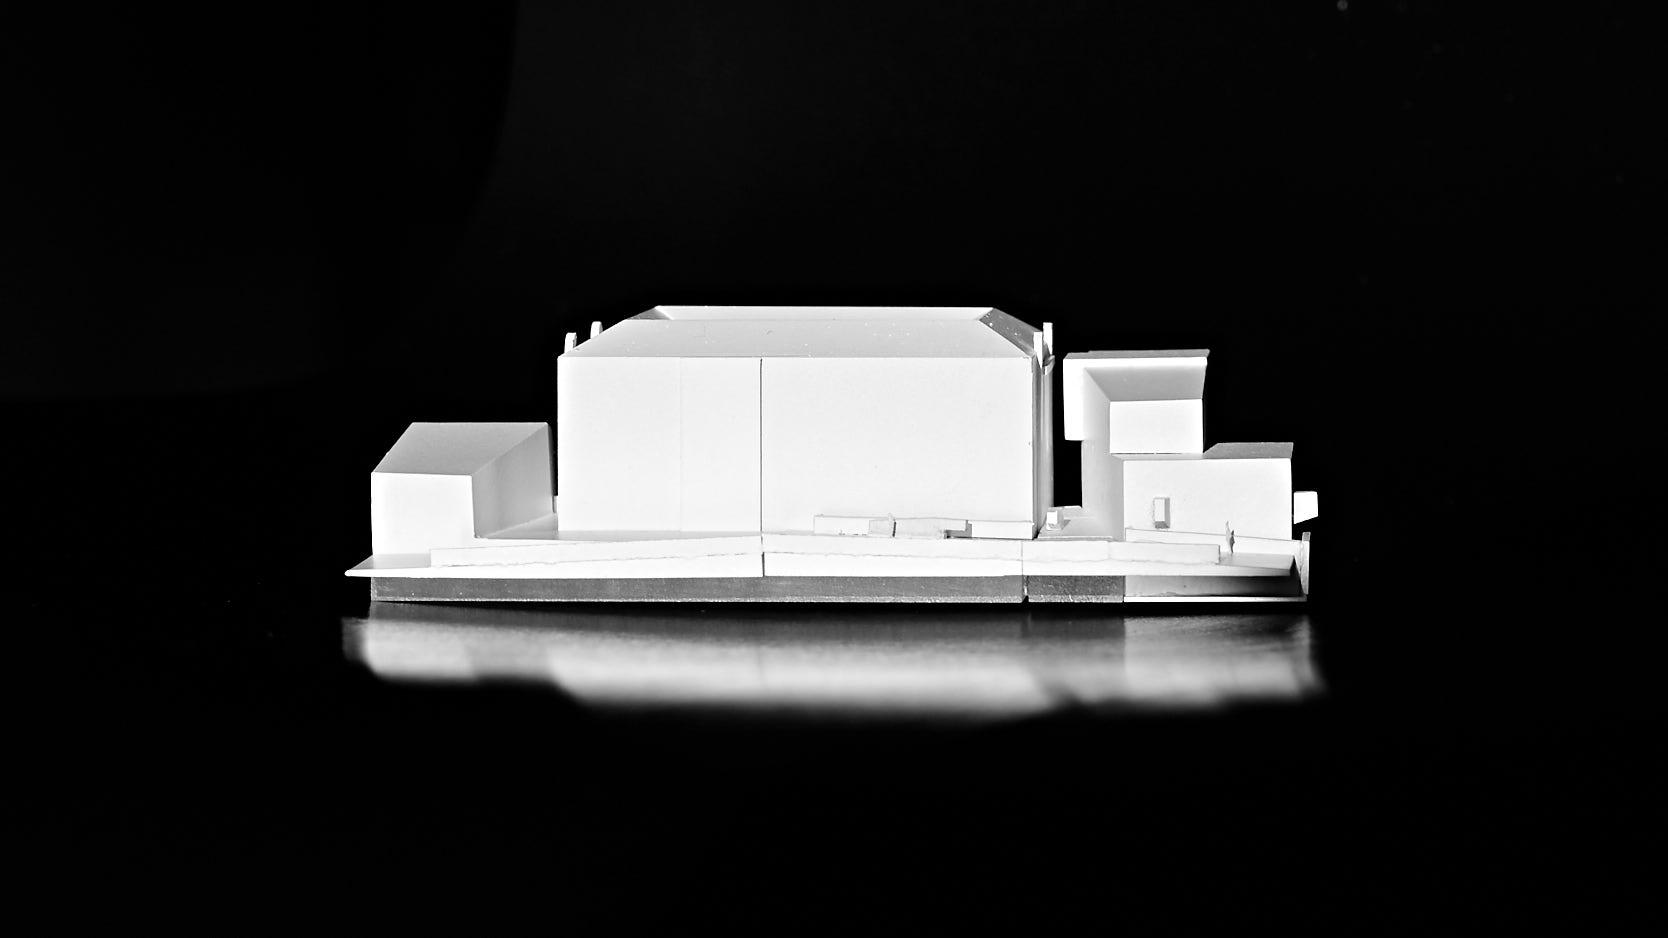 Zentralfriedhof: Model South/West